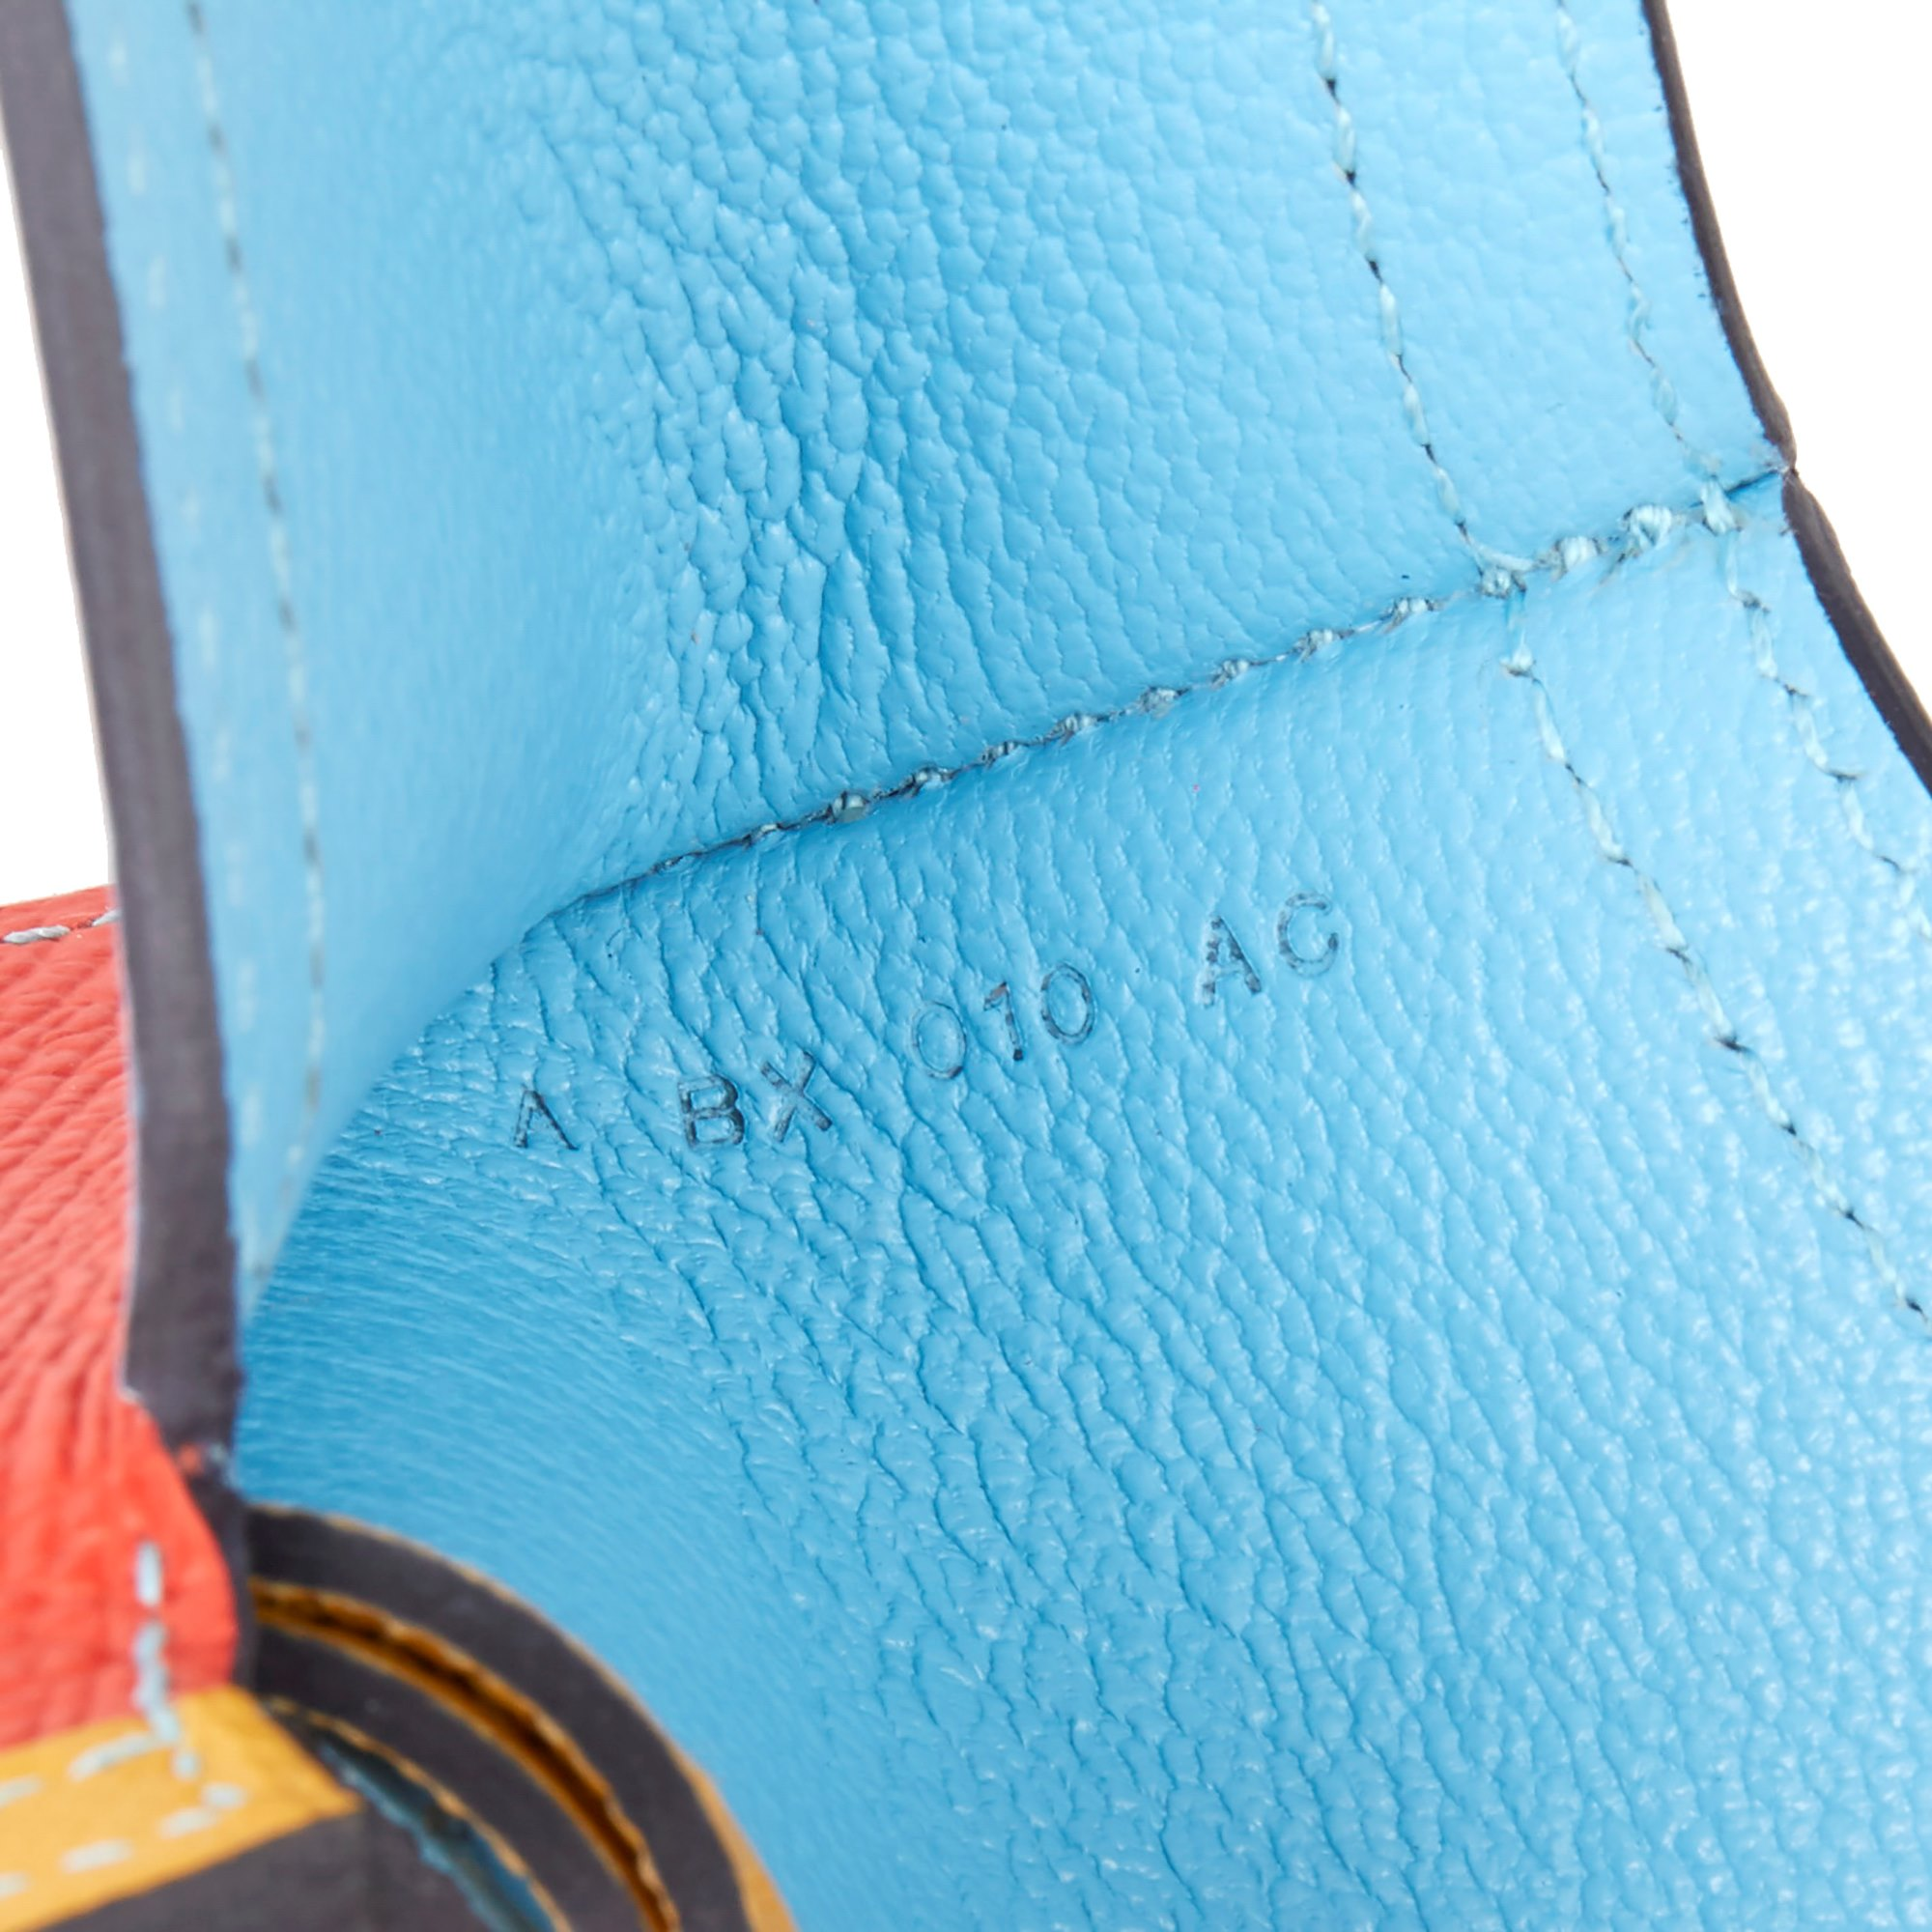 Hermès Celeste, Capucine & Ambre Epsom Leather Camail Key Holder Charm